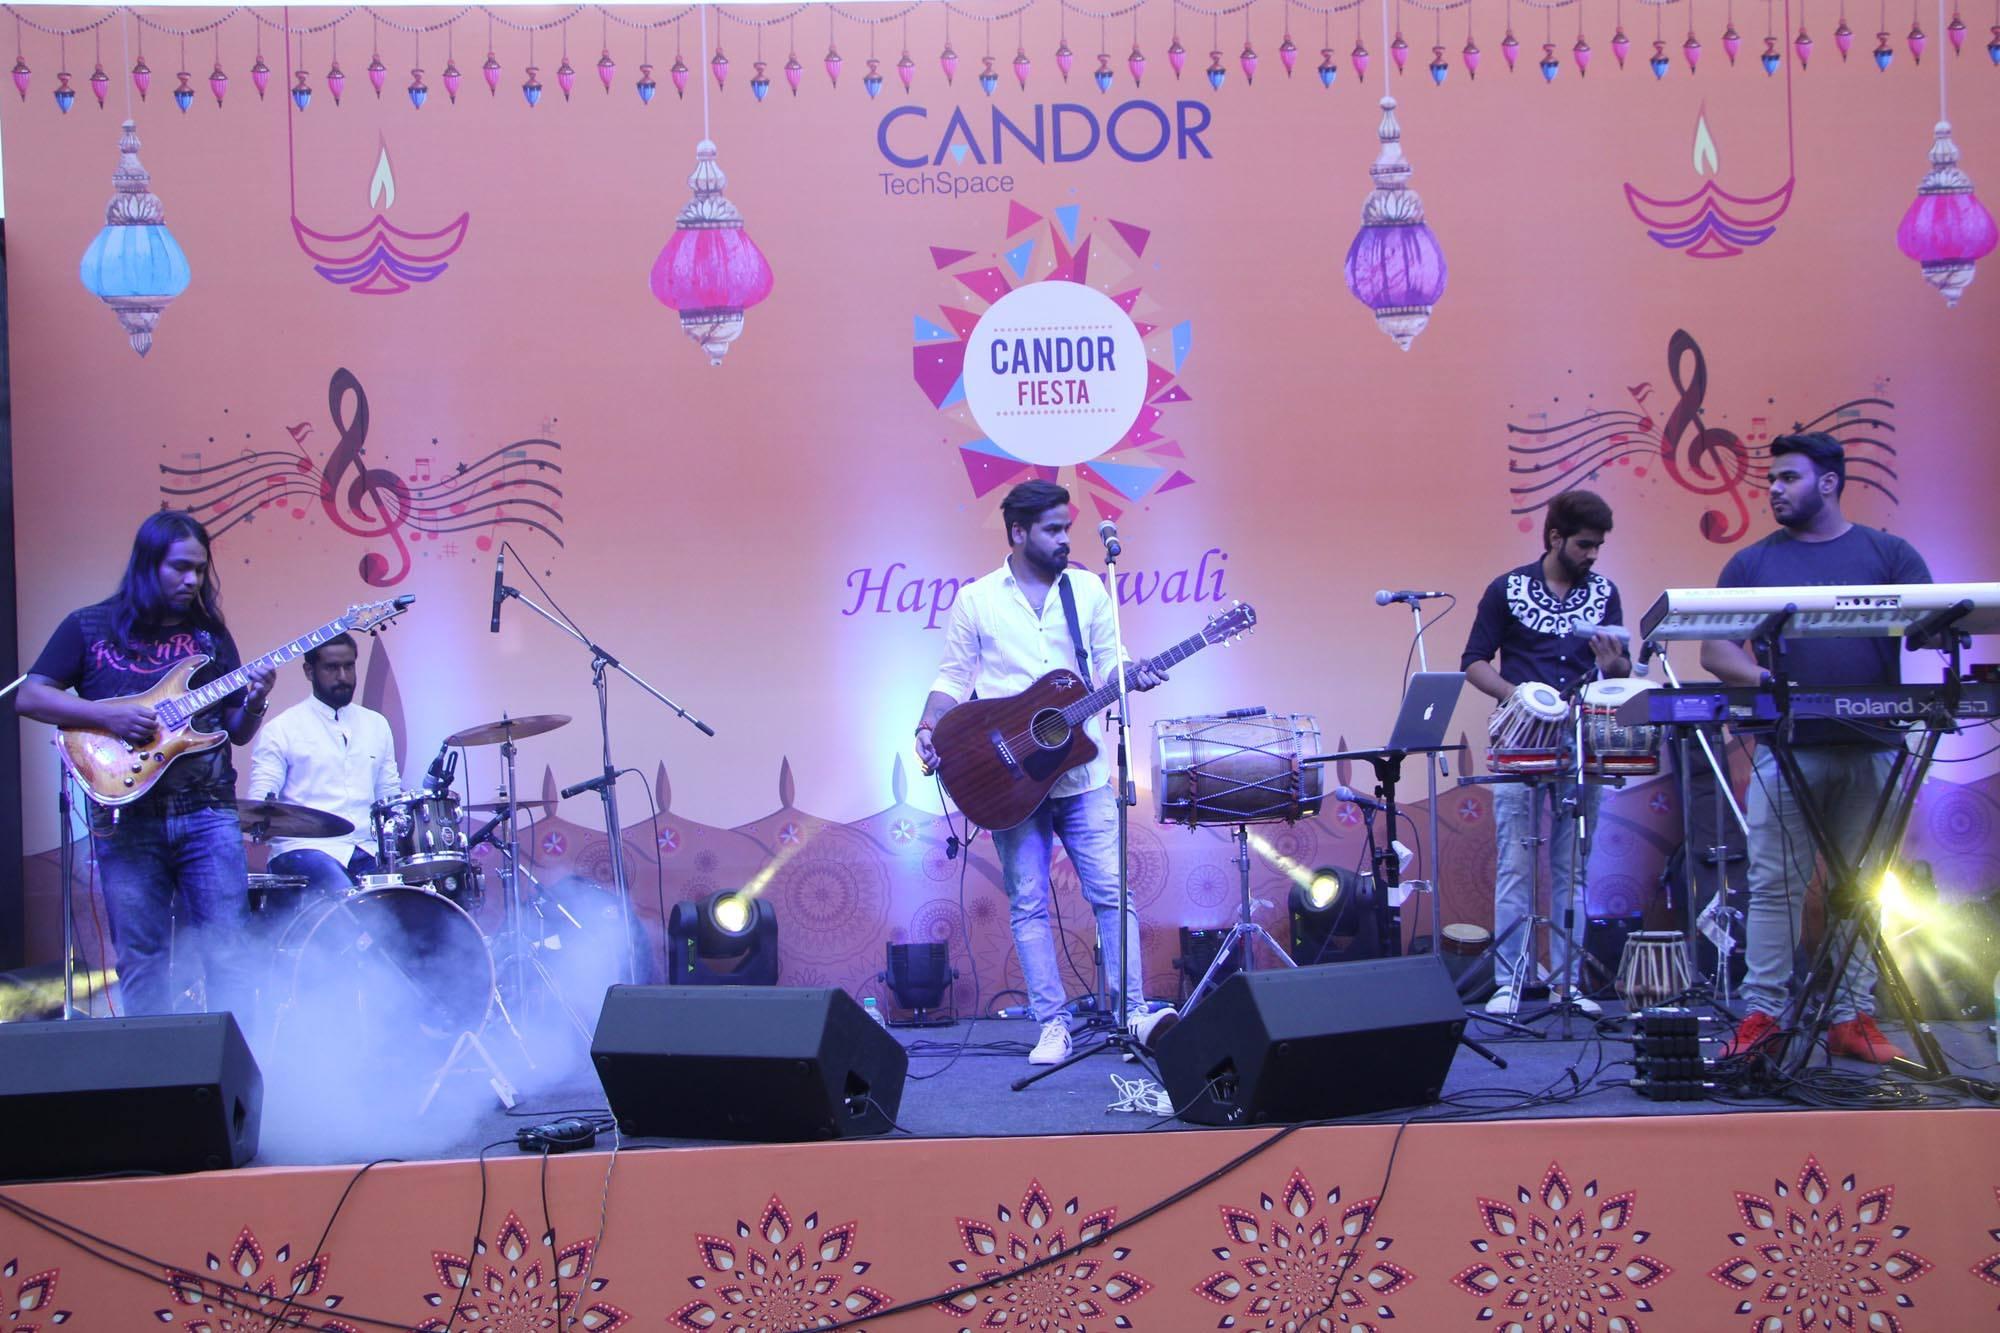 candor-diwali-Noida-62-14.jpg